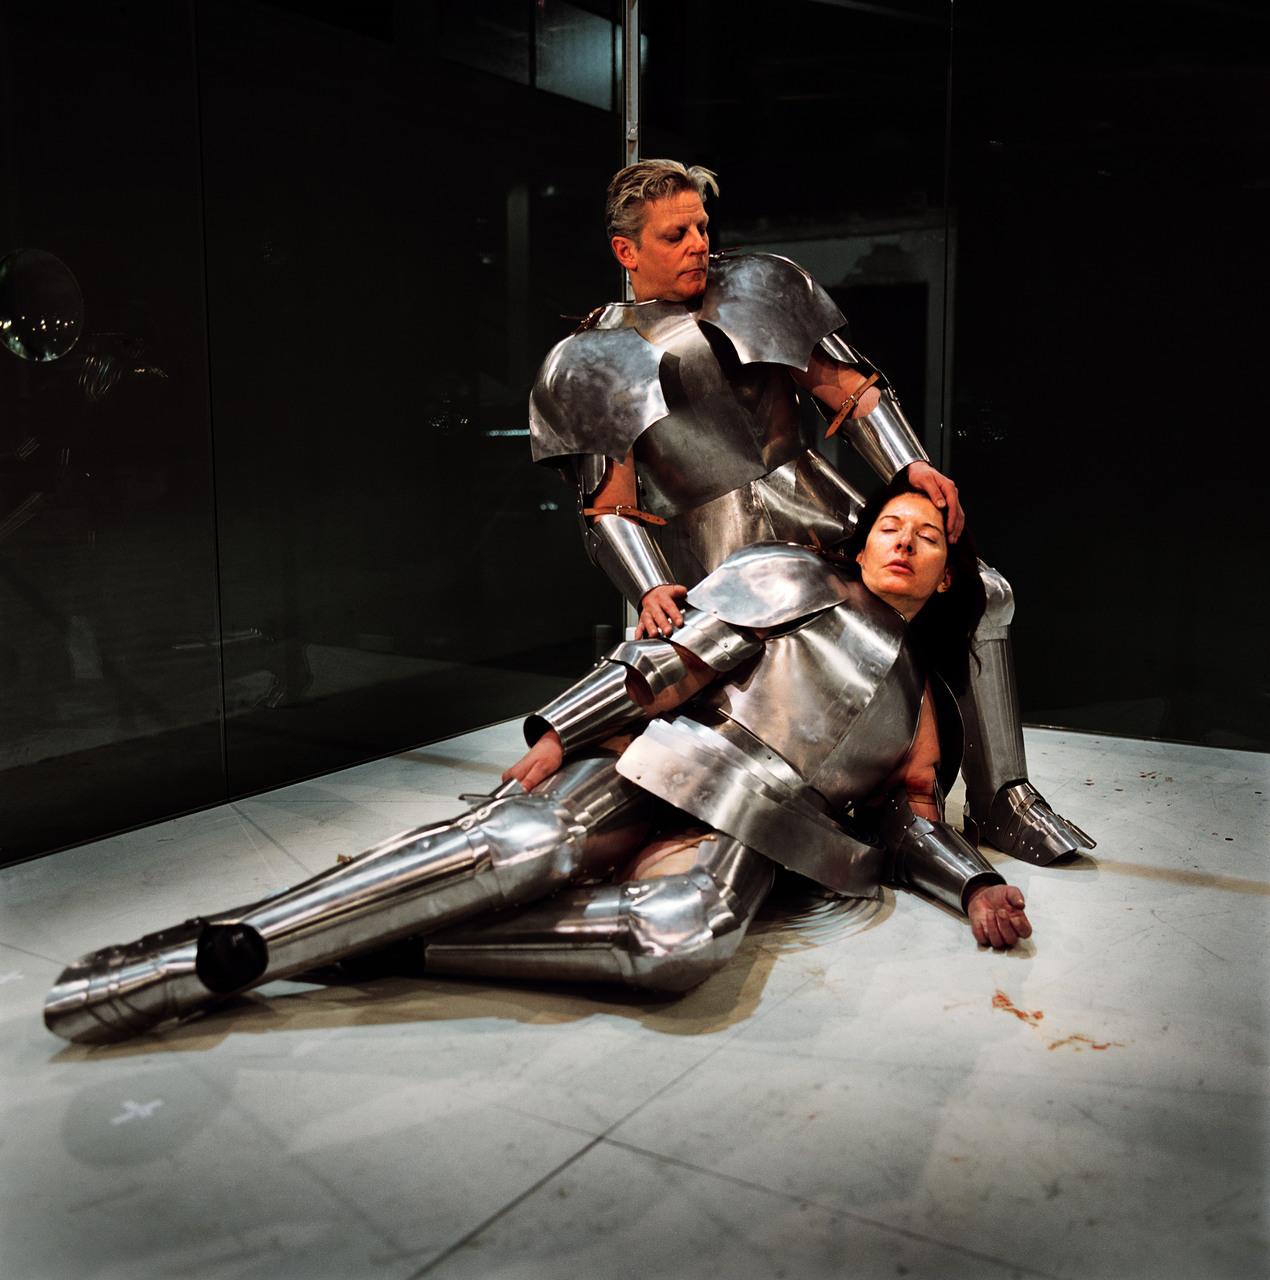 Jan_Fabre,_Virgin_Warrior,_2006,_Musée_dArt_Contemporain_Lyon,_Angelos,_Collection_M_HKA